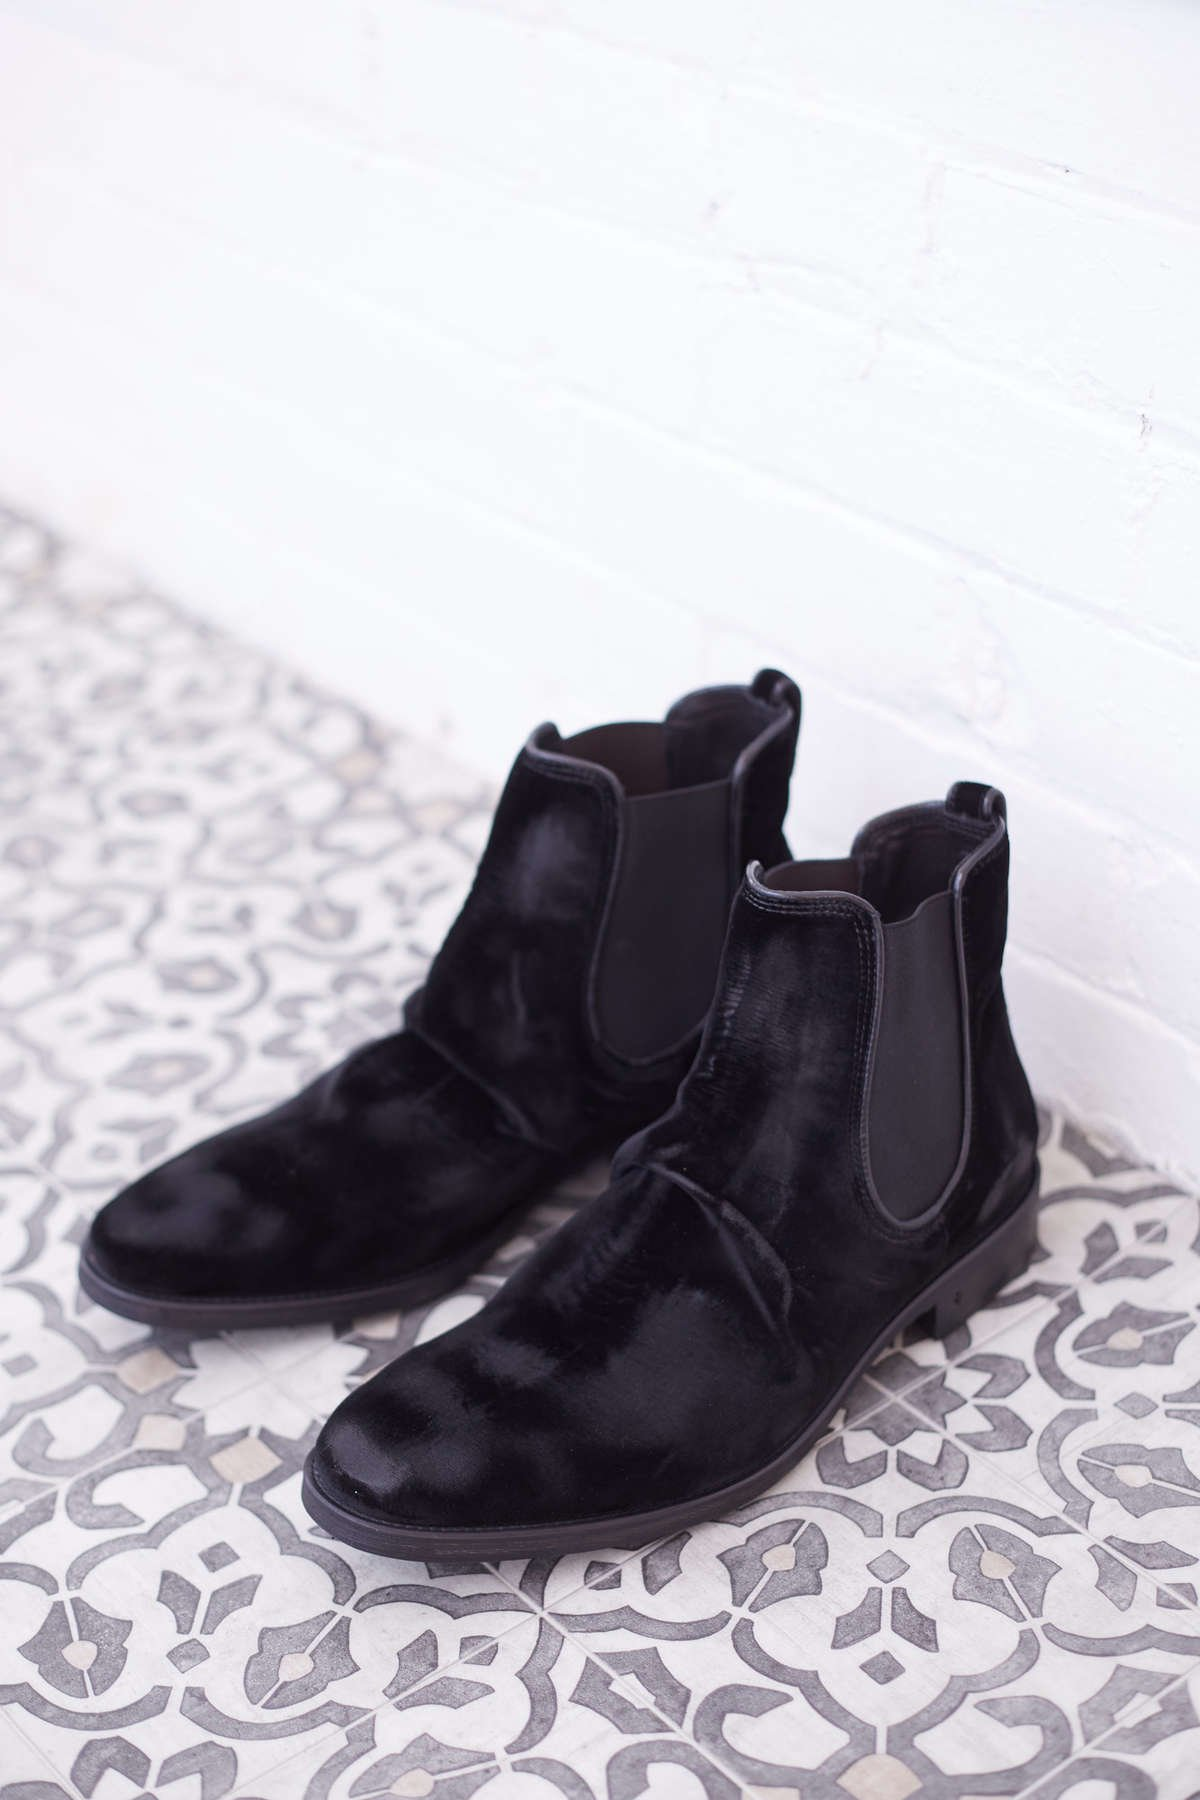 John Varvatos Collection Fleetwood Sharpei Chelsea - Lalonde's Boutique